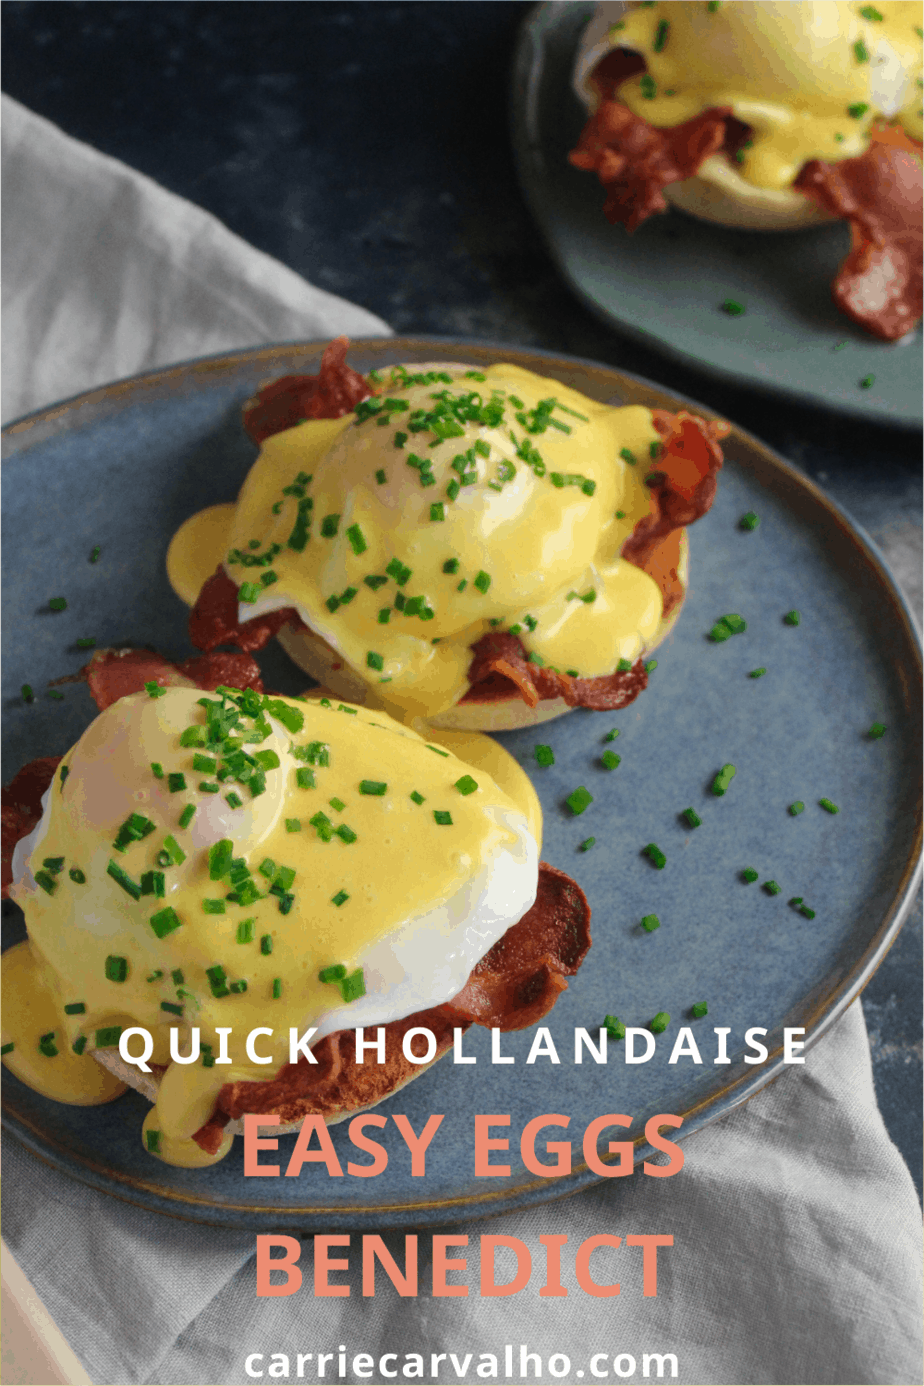 Easy Eggs Benedict with Quick Hollandaise